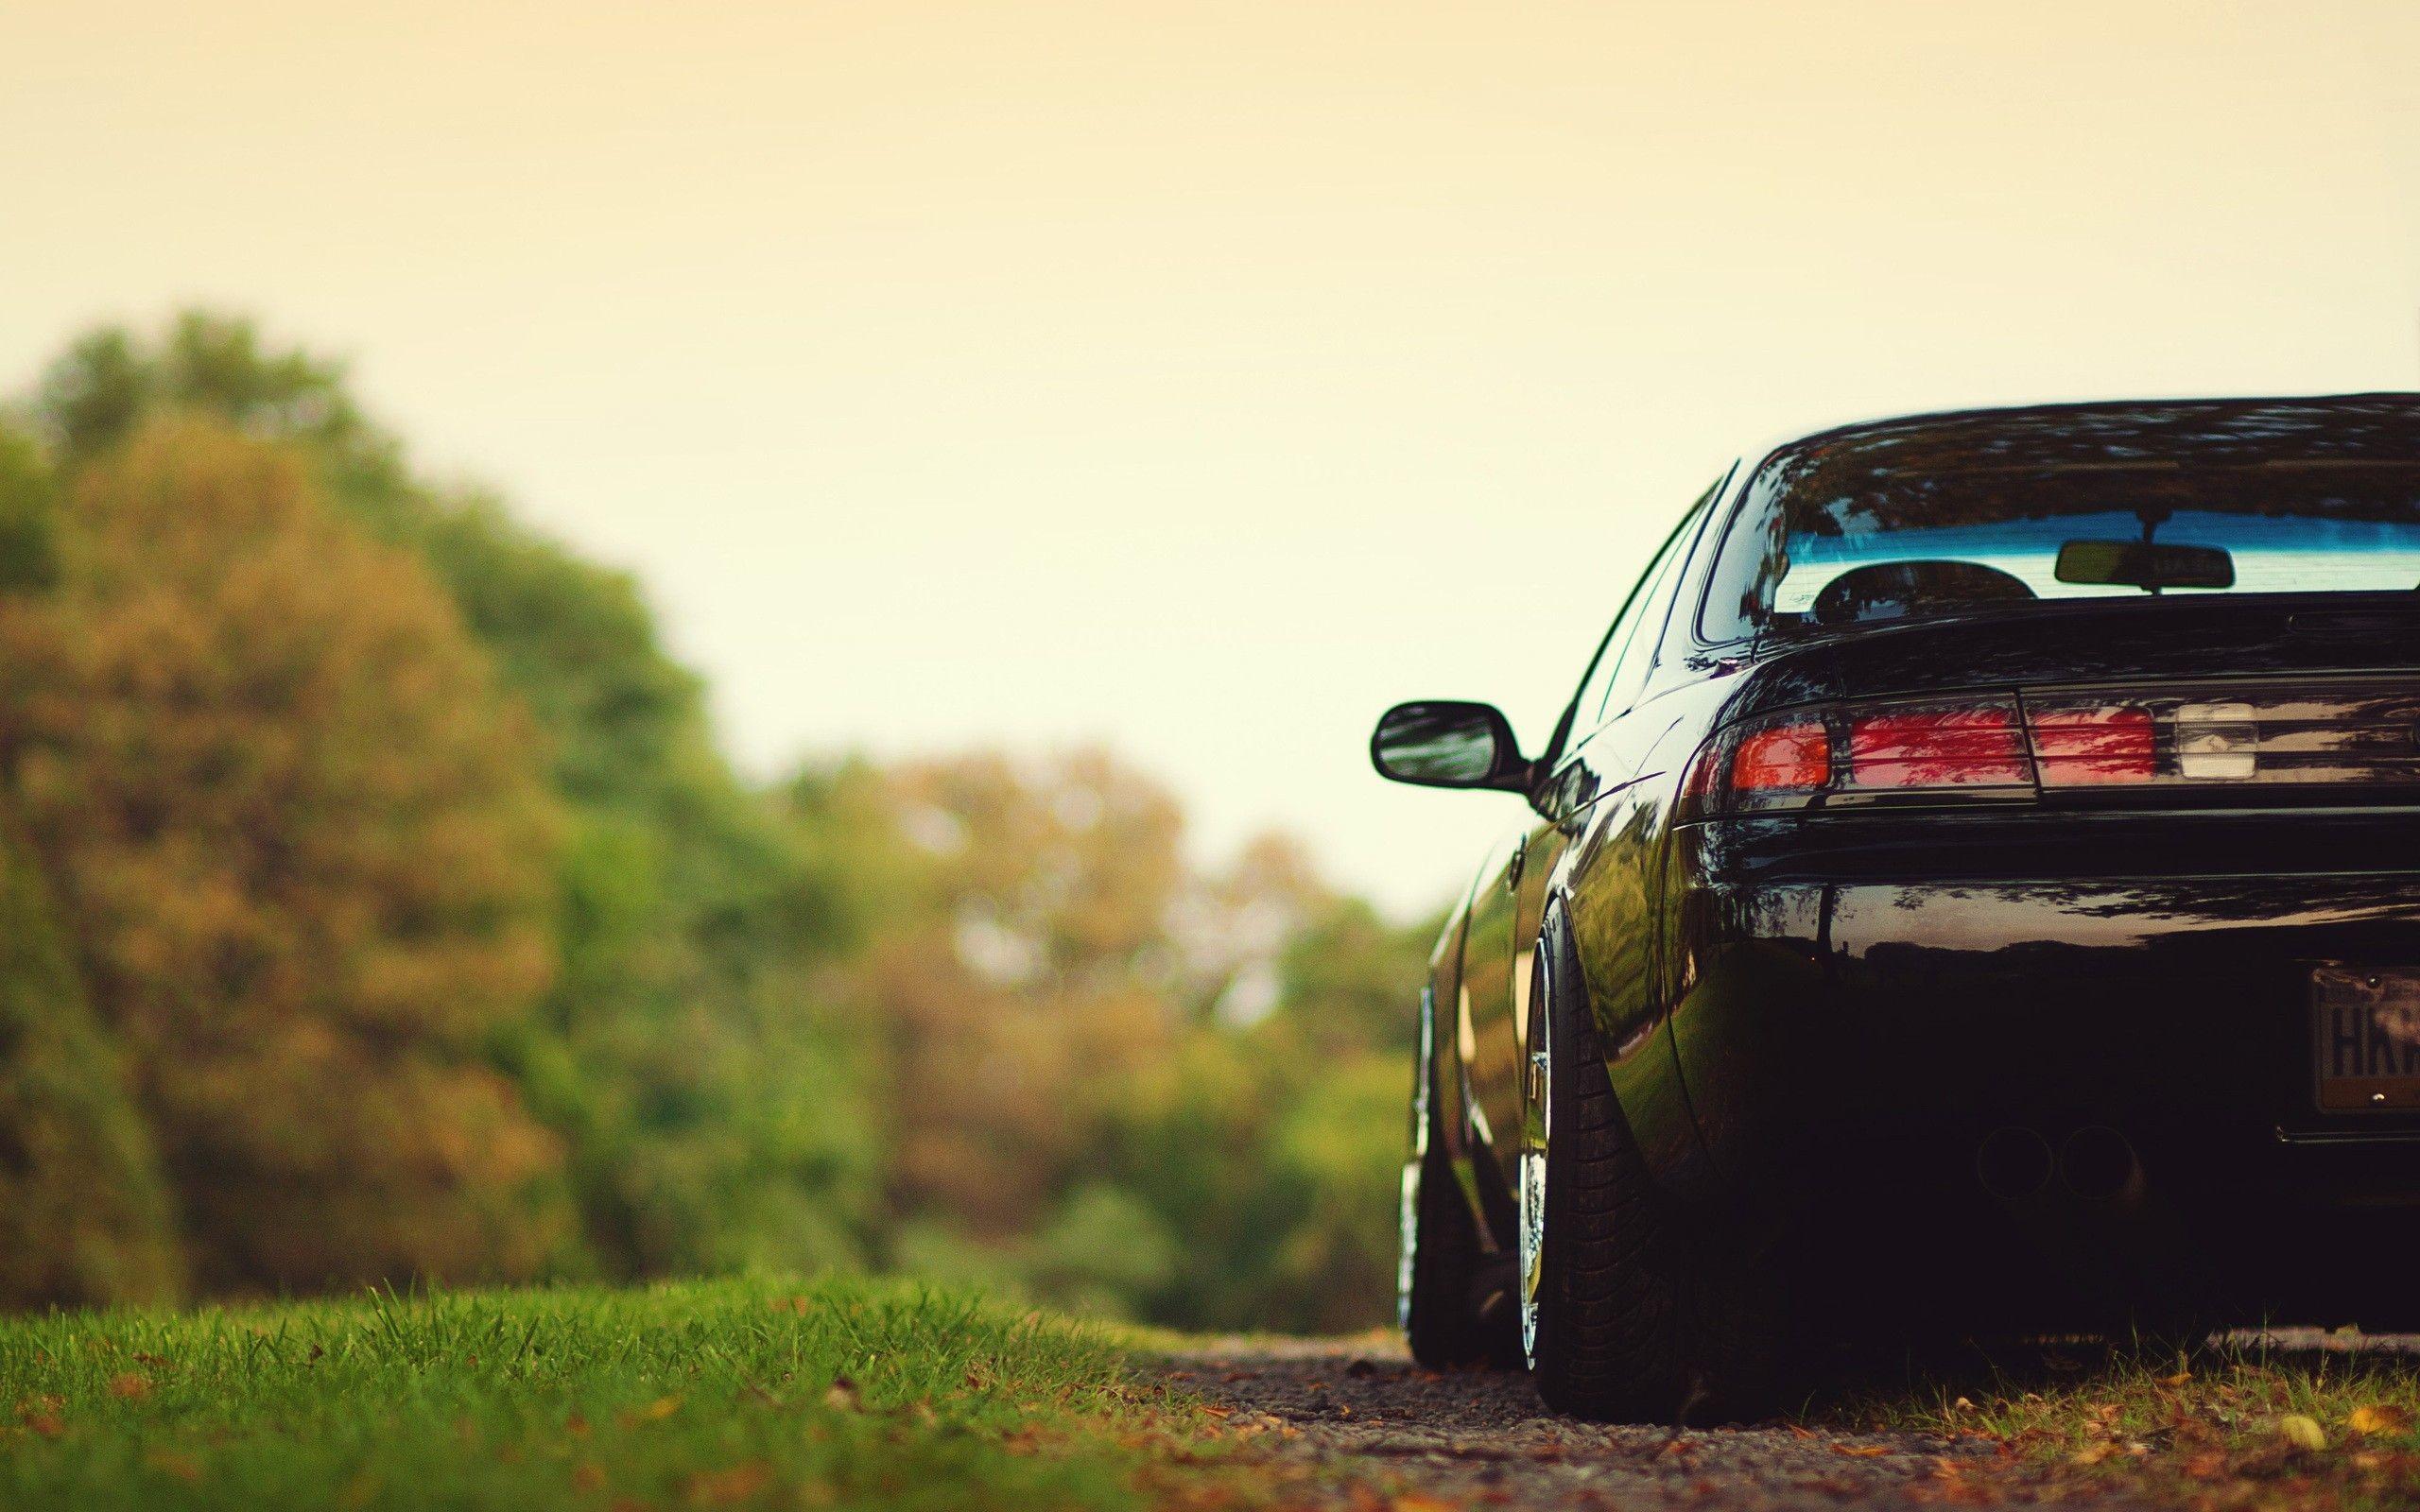 Nissan Silvia Wallpapers – Full HD wallpaper search